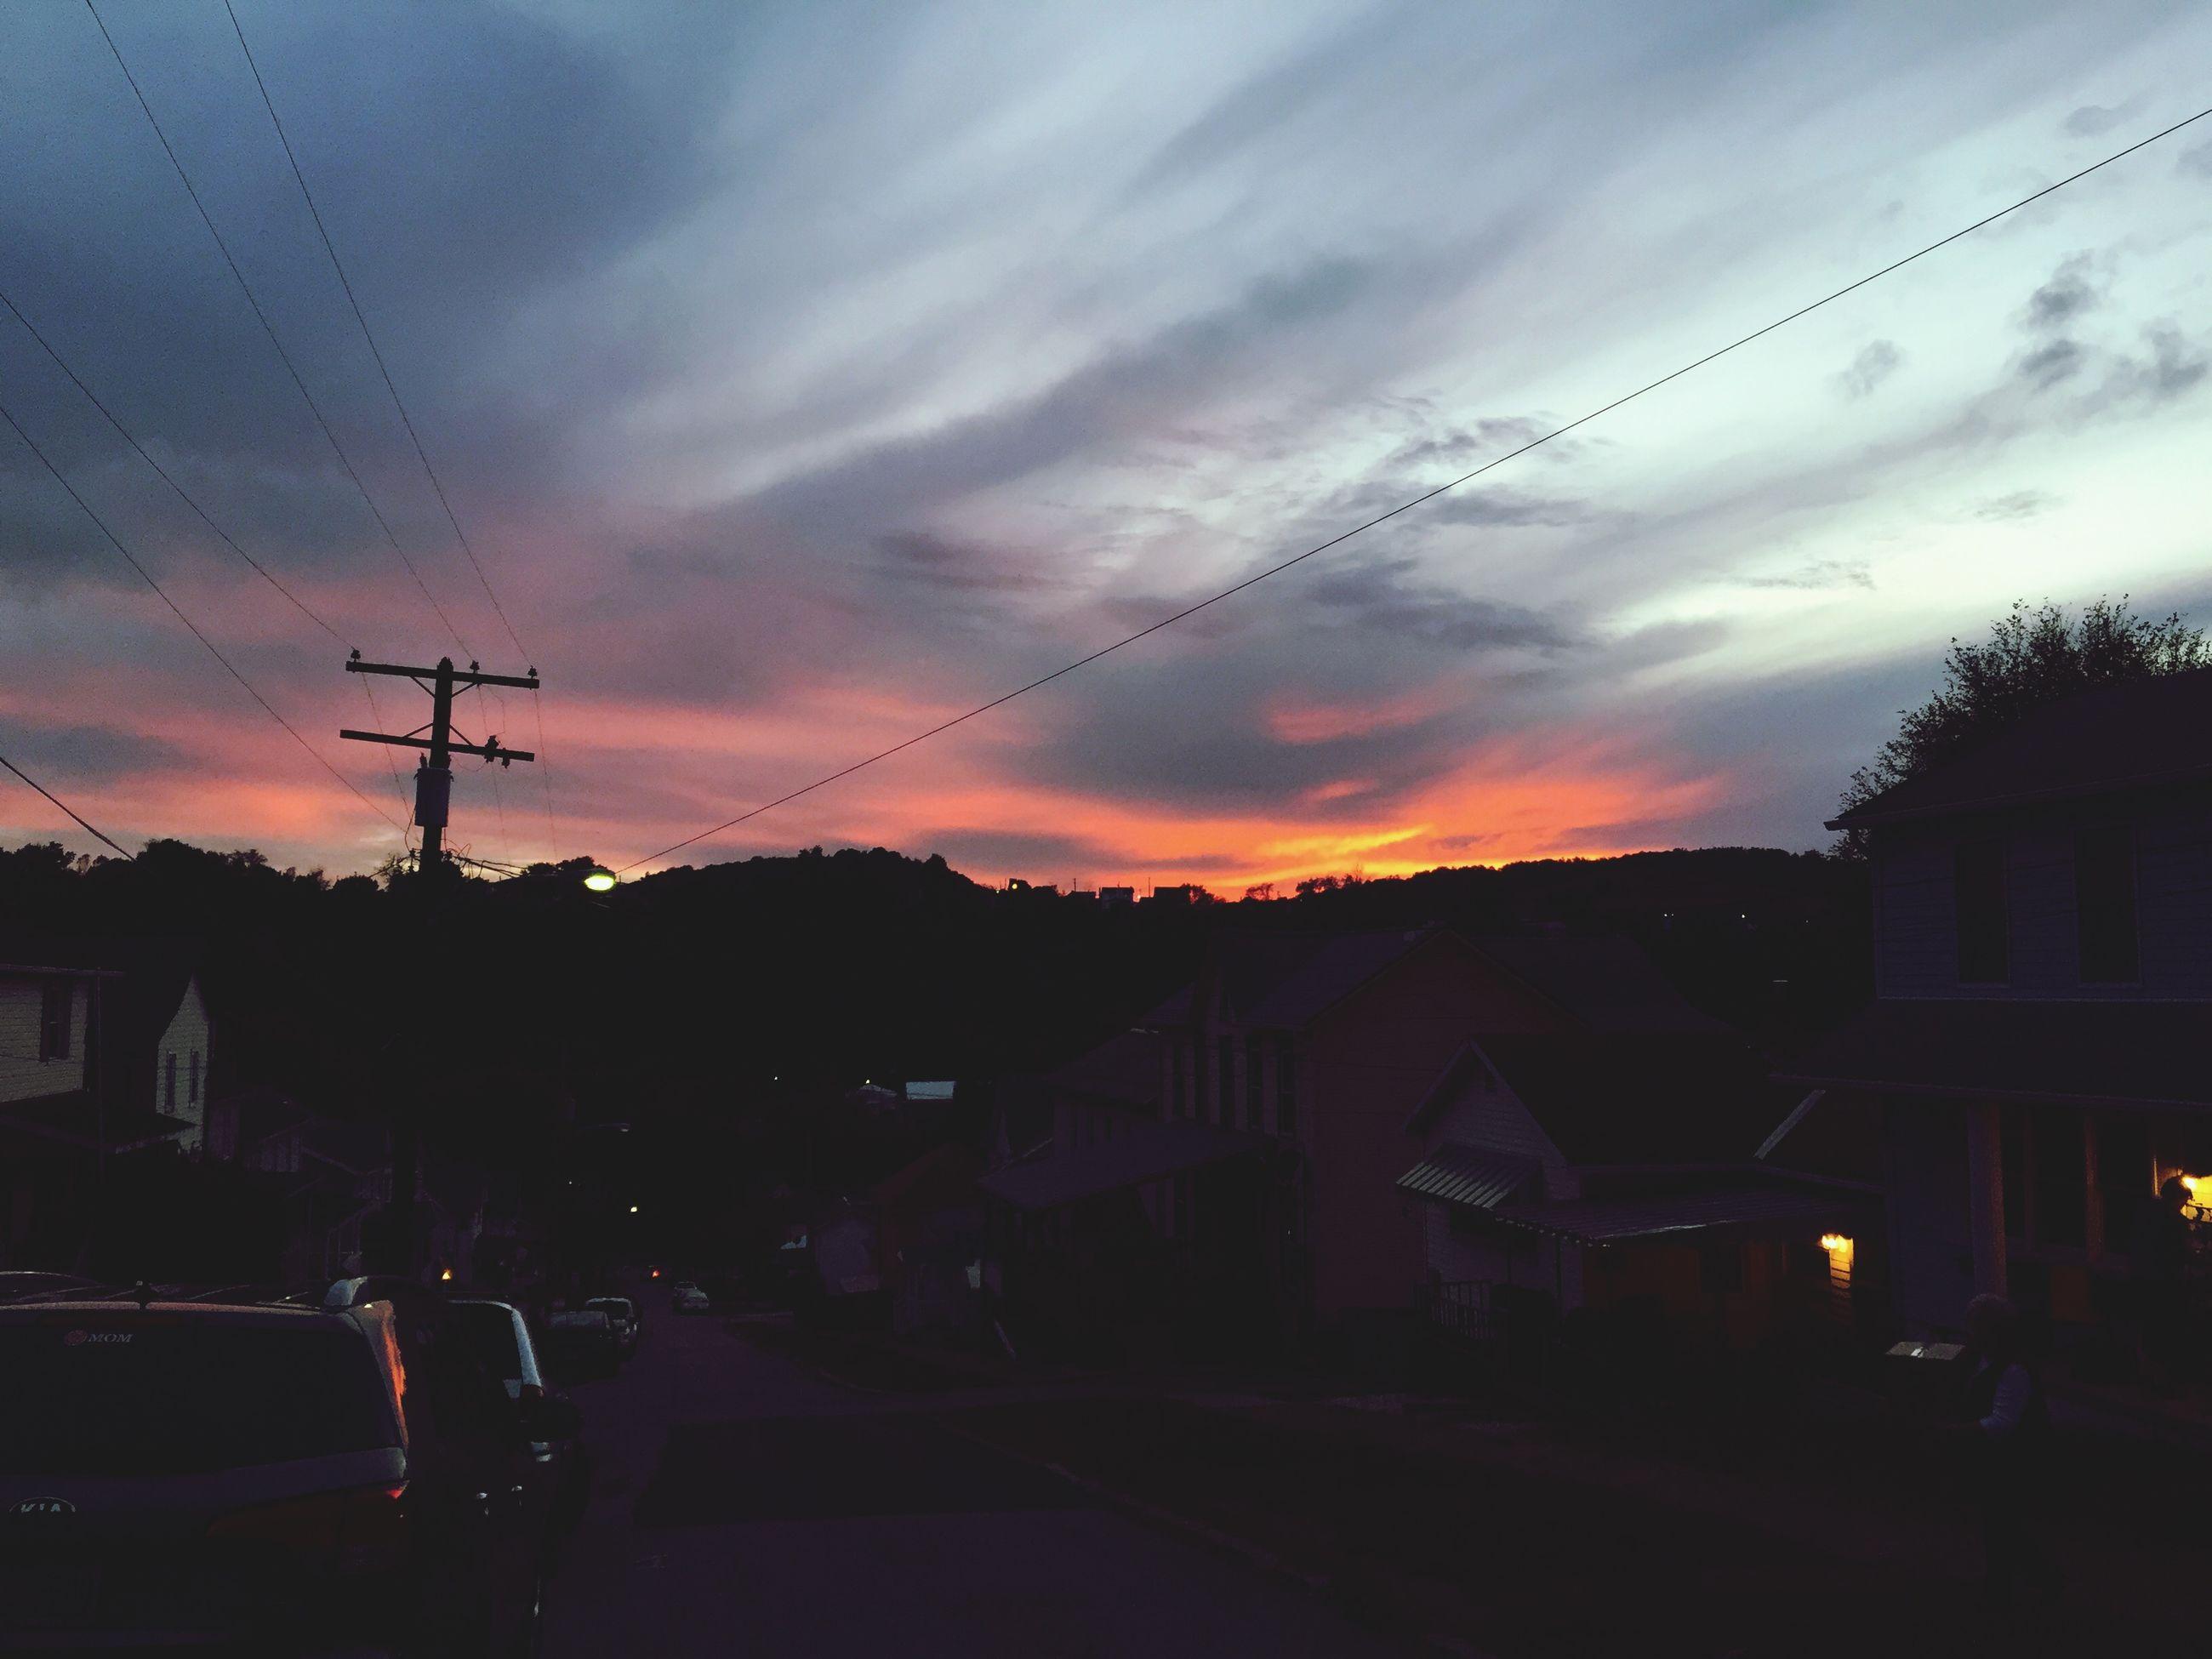 sunset, sky, silhouette, electricity pylon, cloud - sky, power line, building exterior, transportation, built structure, architecture, house, dusk, cloudy, cloud, car, street light, electricity, road, mode of transport, street